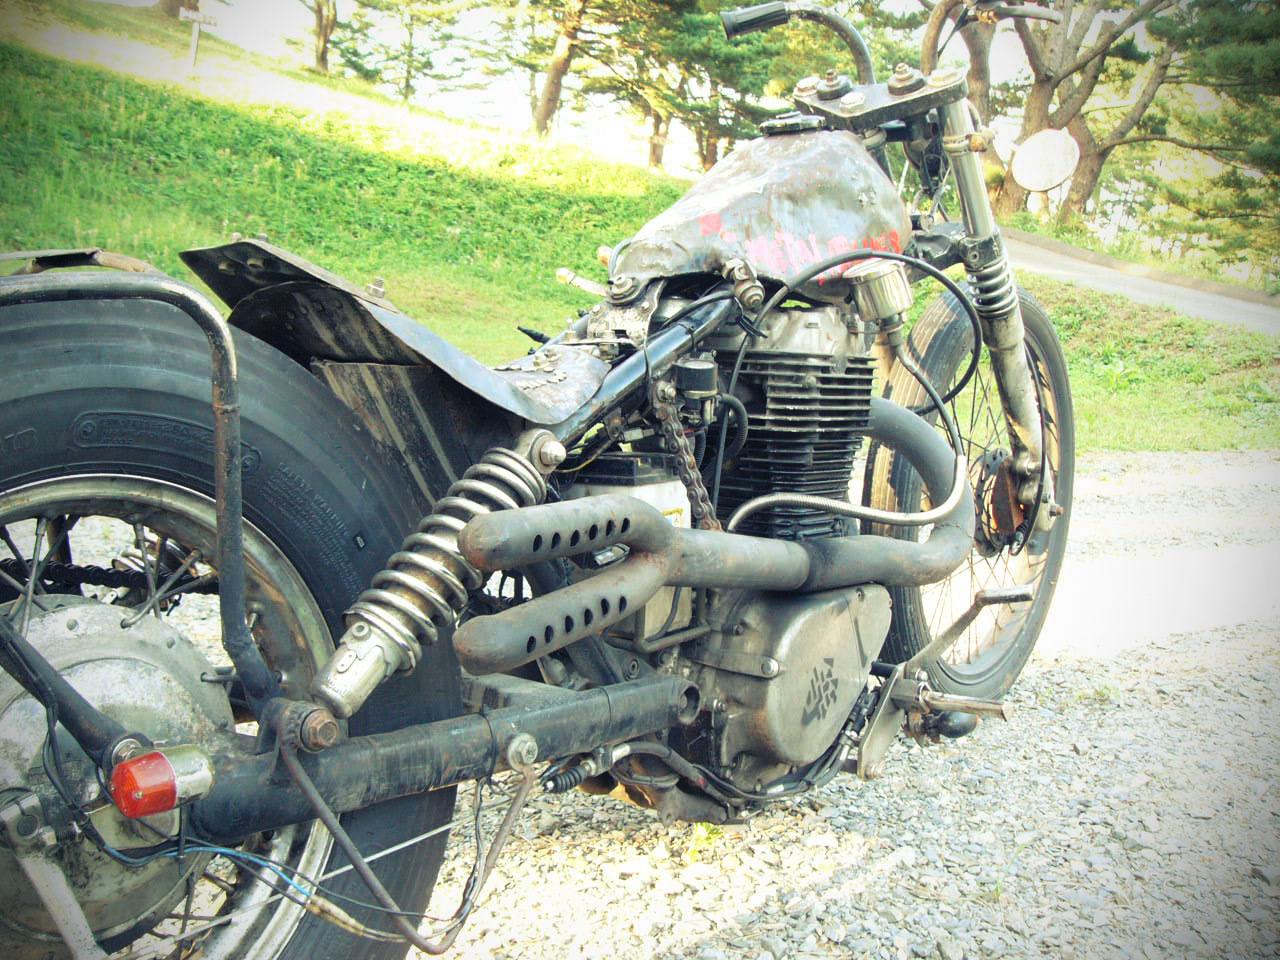 Free The Wheels Suzuki Savage Rat Rod